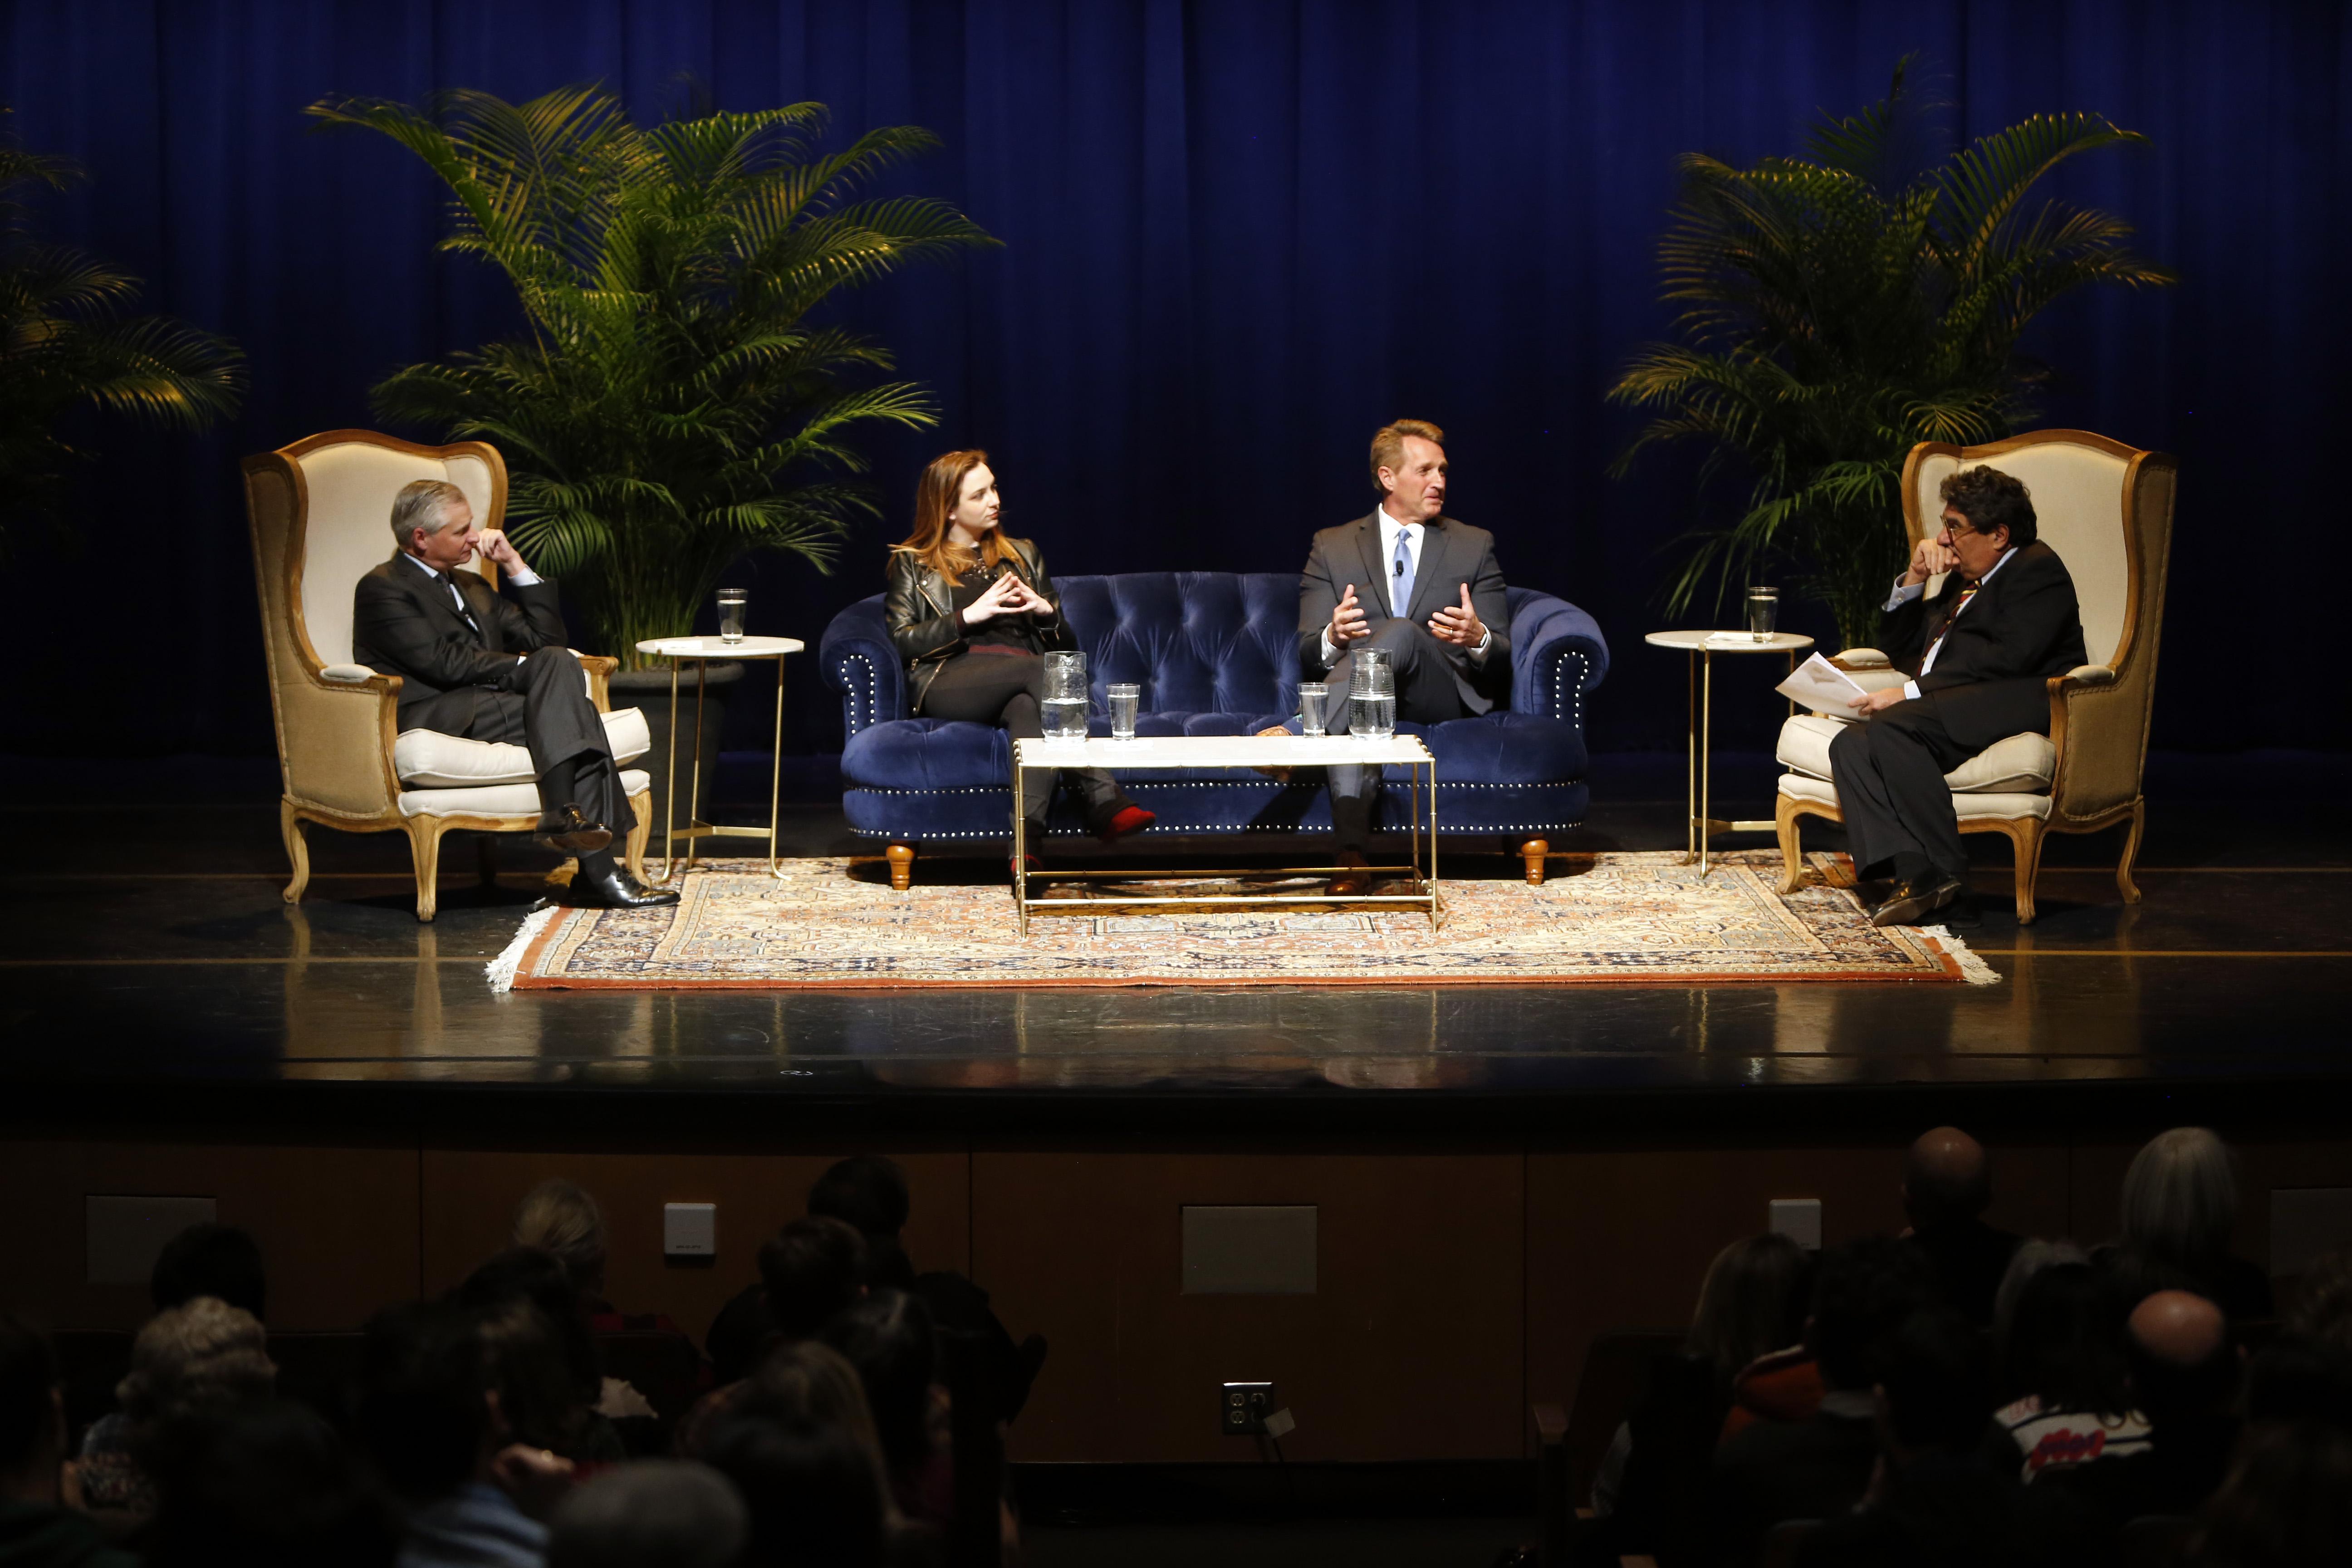 L-r: Jon Meacham, Zoe Chace, Sen. Jeff Flake and Chancellor Nicholas S. Zeppos(Vanderbilt University / Steve Green)